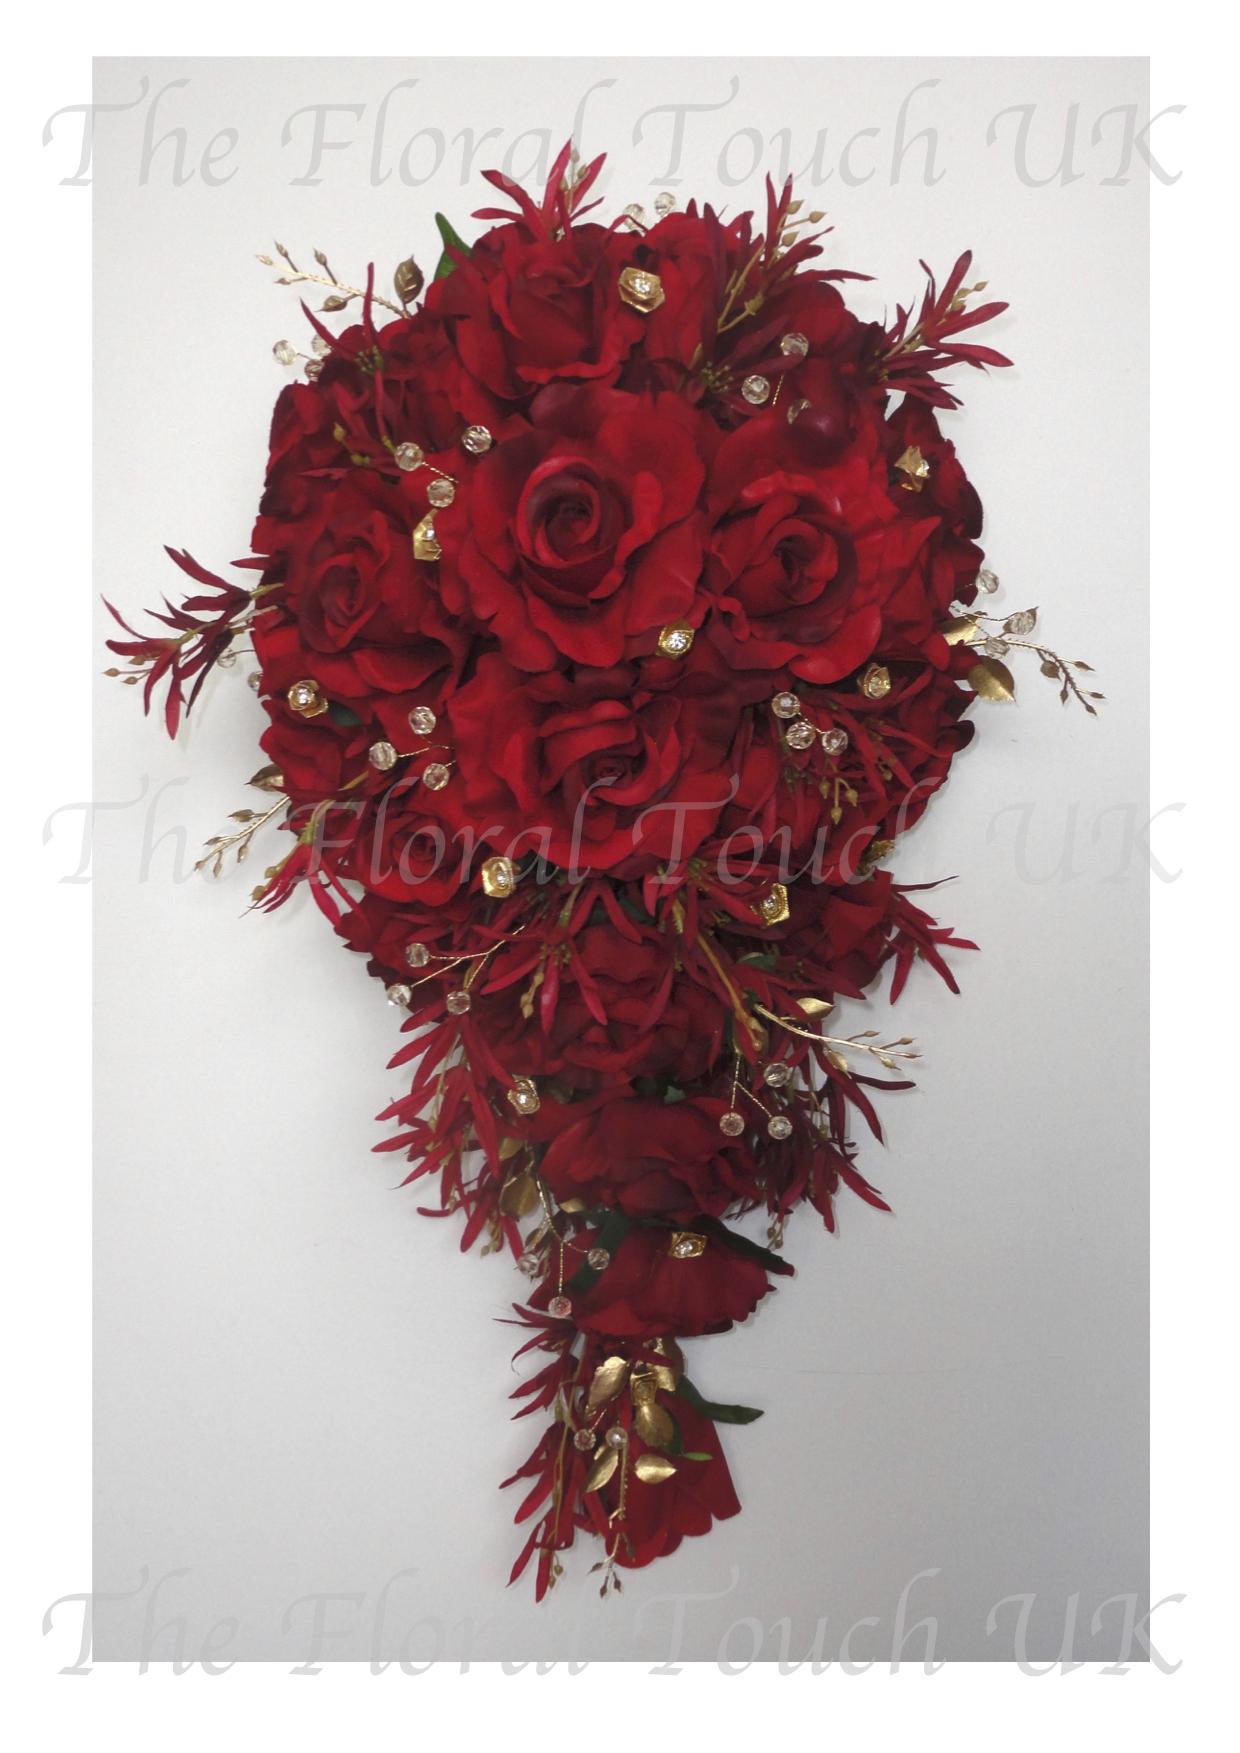 Bridal Shower Bouquets | Teardrop Wedding Bouquets| The ... - photo#35